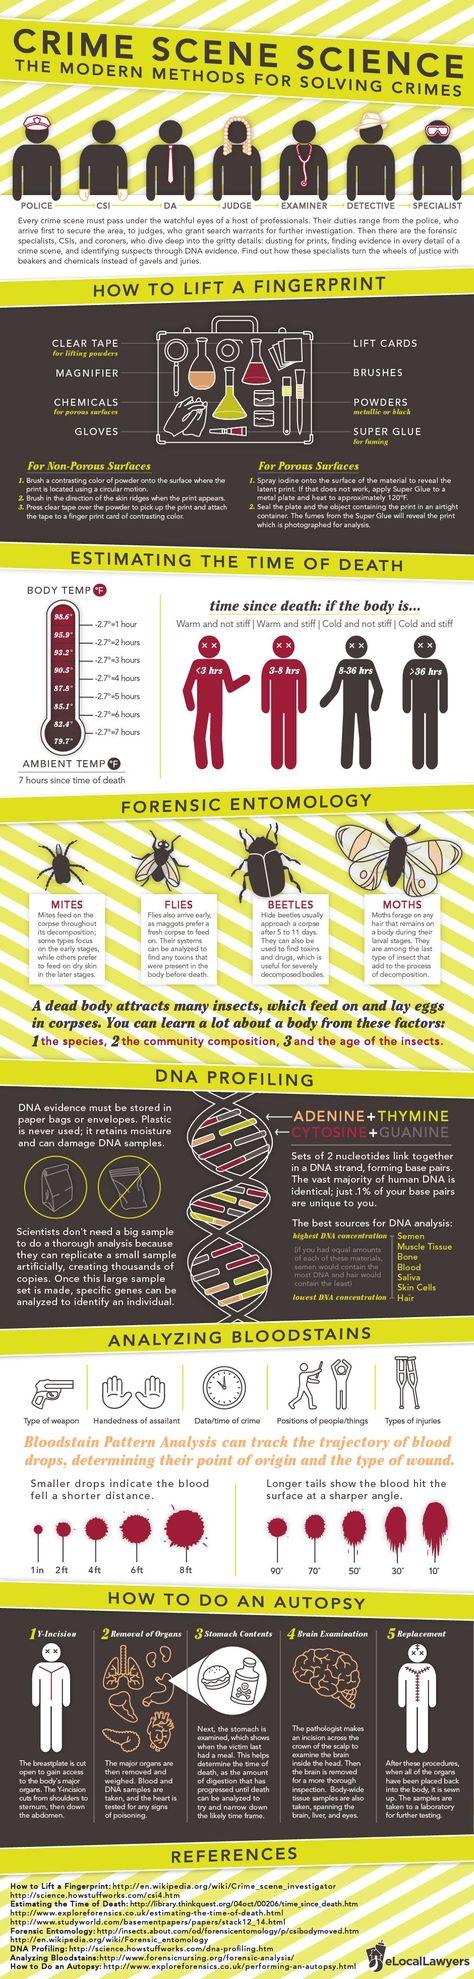 Crime Scene Science - The Methods Used #infographics #law #pod — Lightscap3s.com